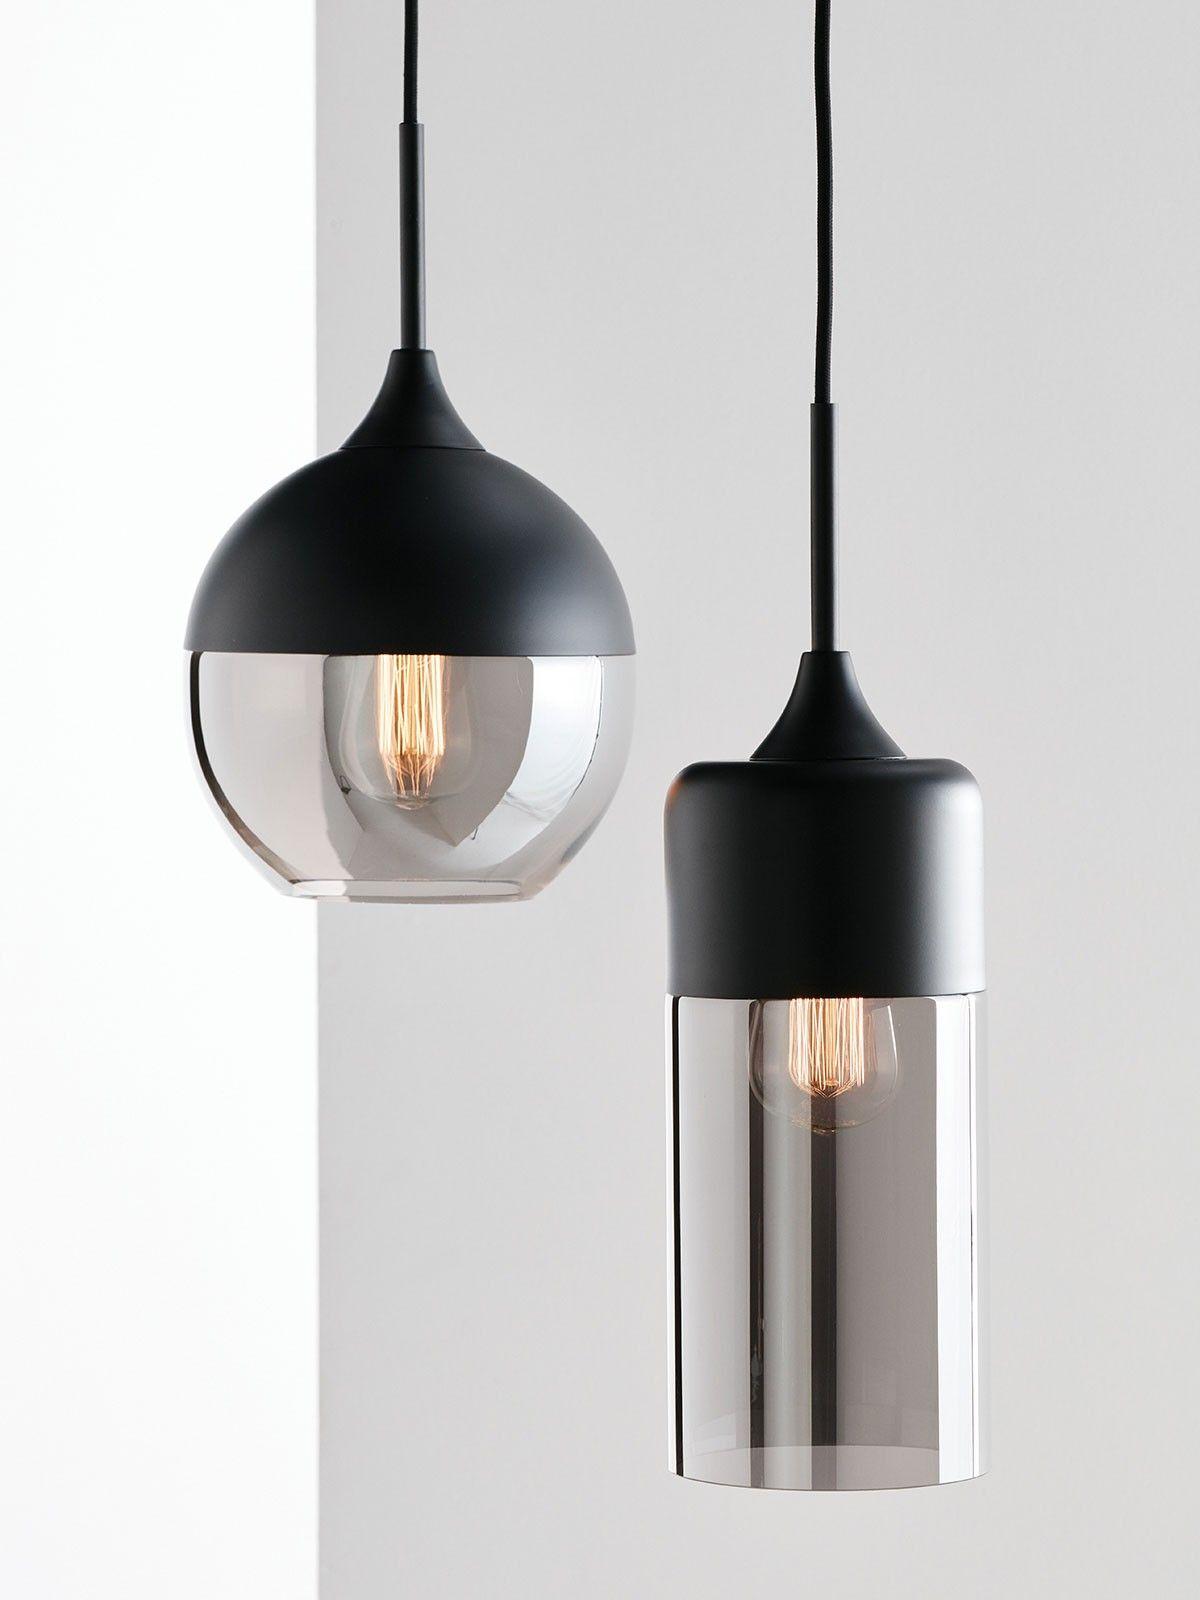 Lunar 1 Light Round Pendant In Black/smoke | New House In Demi 1 Light Globe Pendants (View 10 of 30)